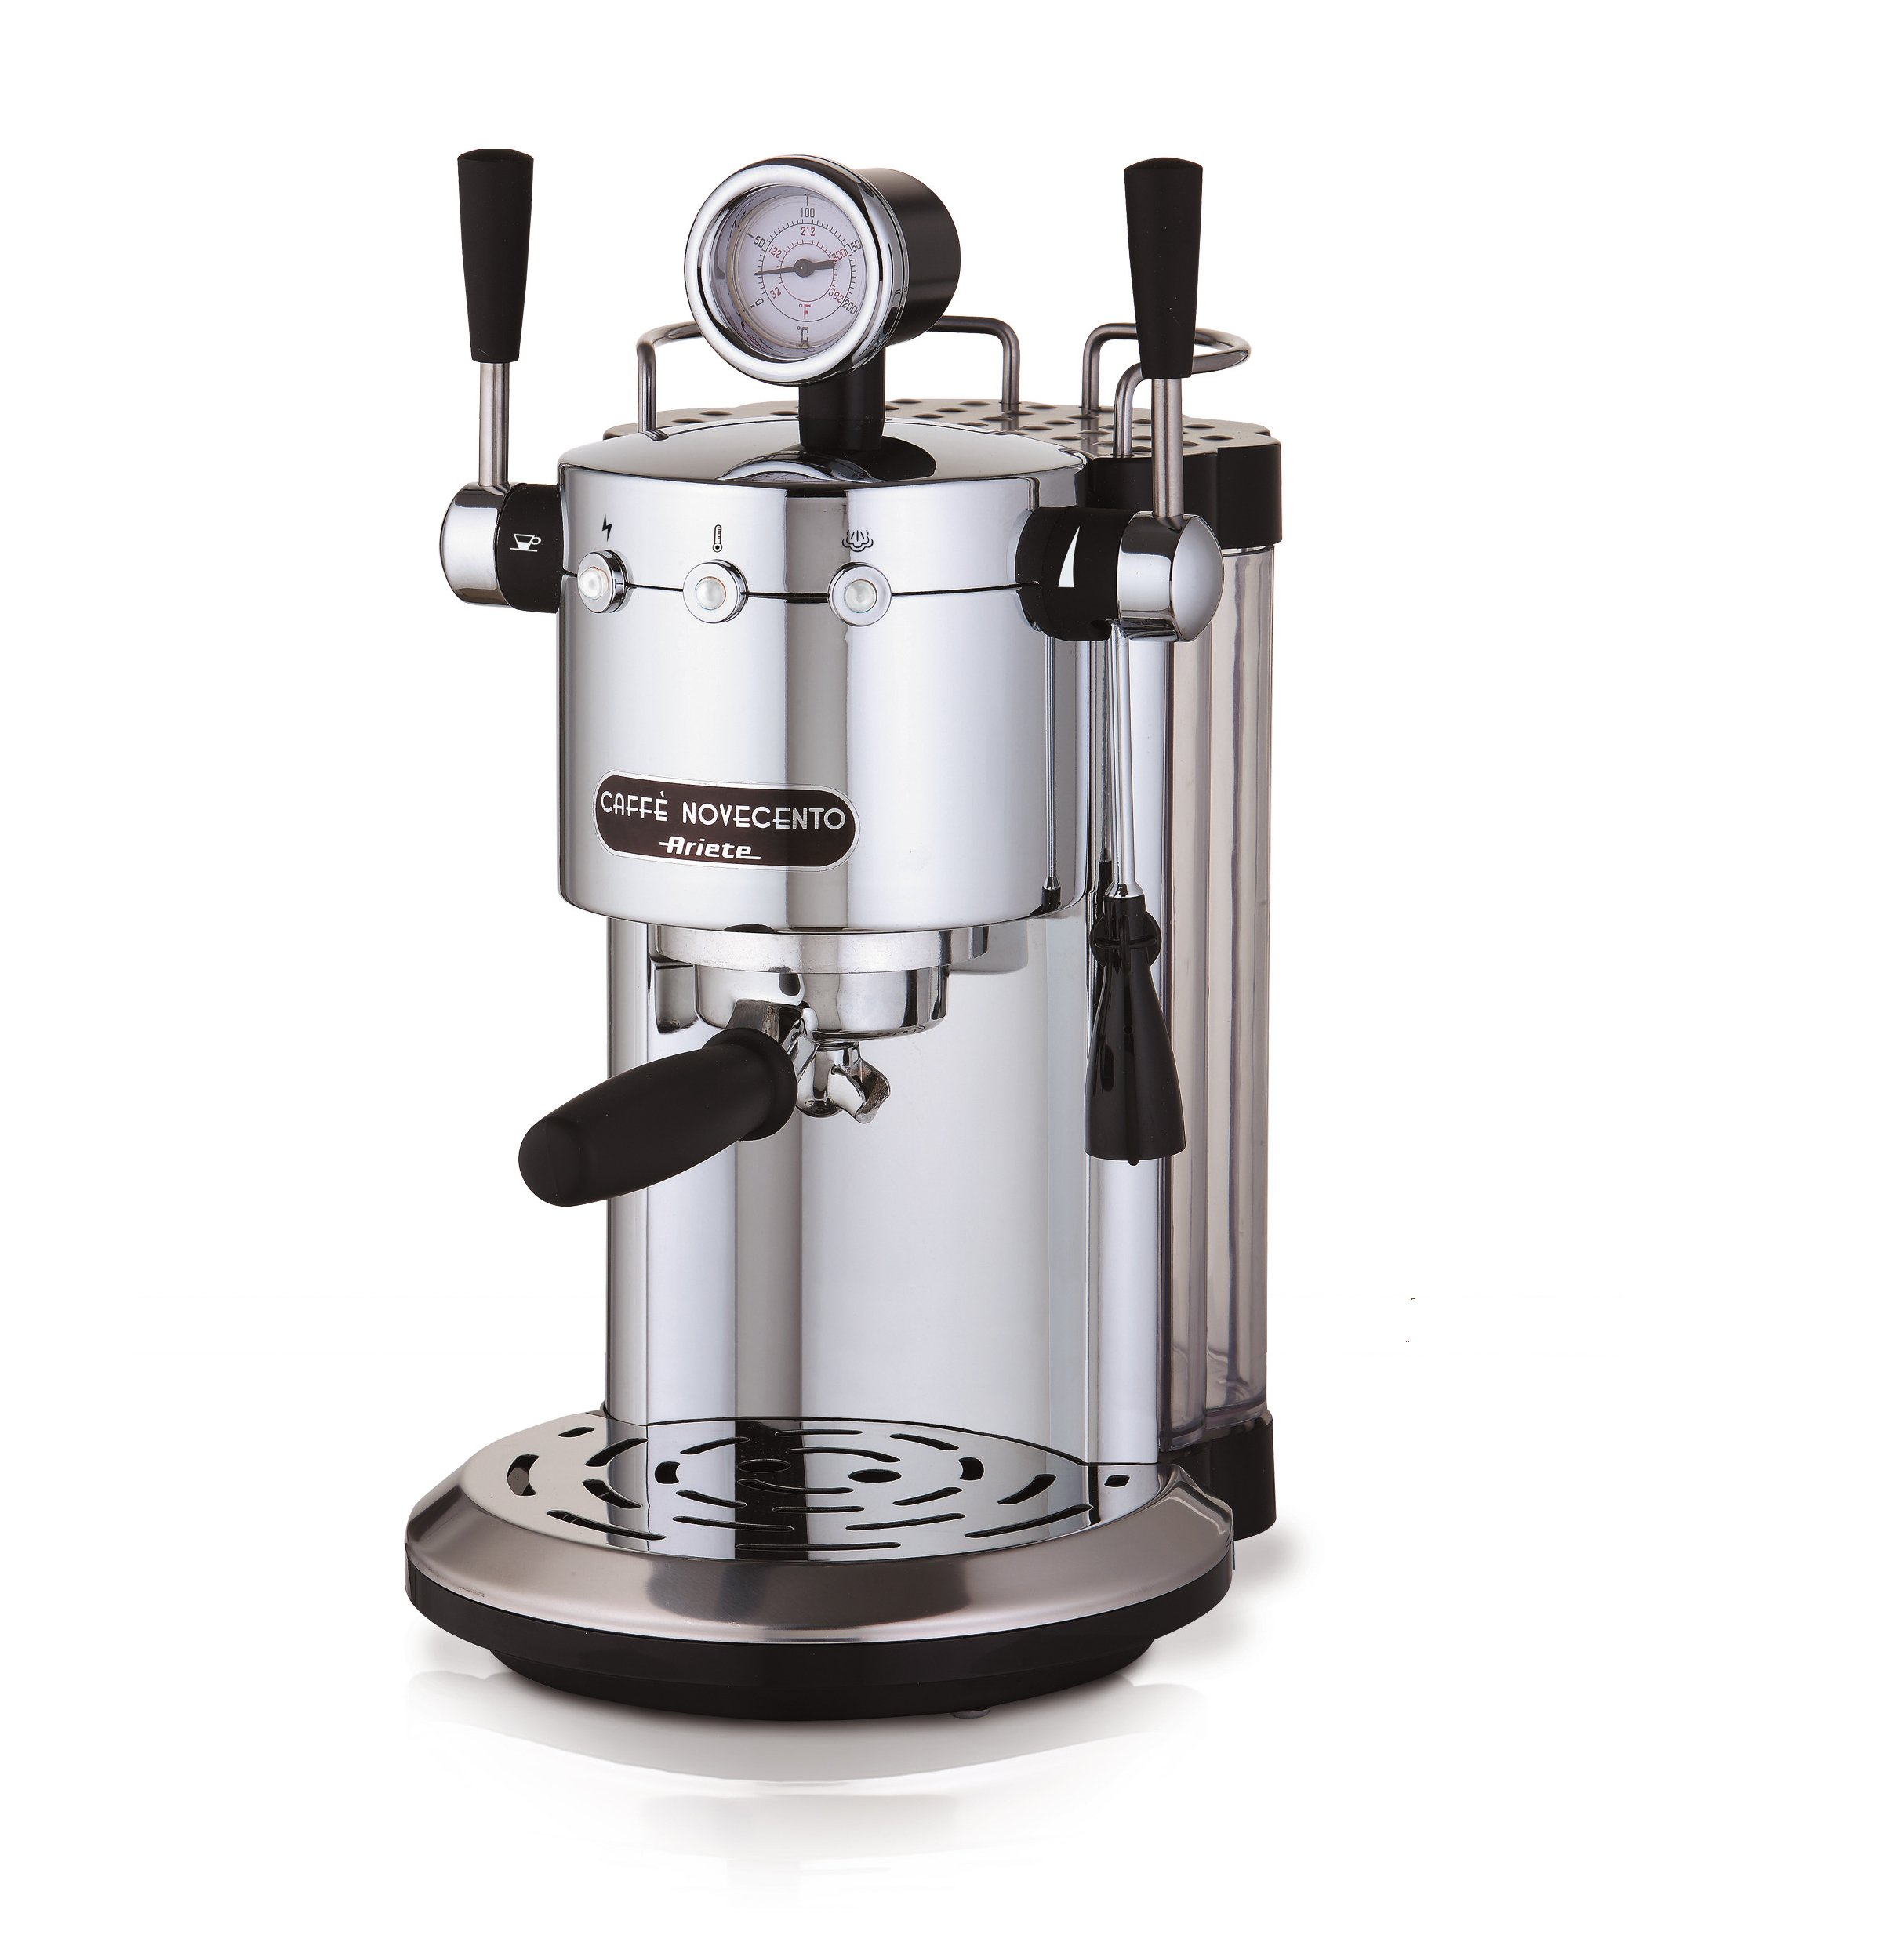 Ariete-1387-138720-Kaffeevollautomat-Novecento-Espresso-Cappuccino-Vano-Scalda-Becher-1100-W-2-Tassen-15-bar-Chrom-Silberschwarz-1150-kilograms